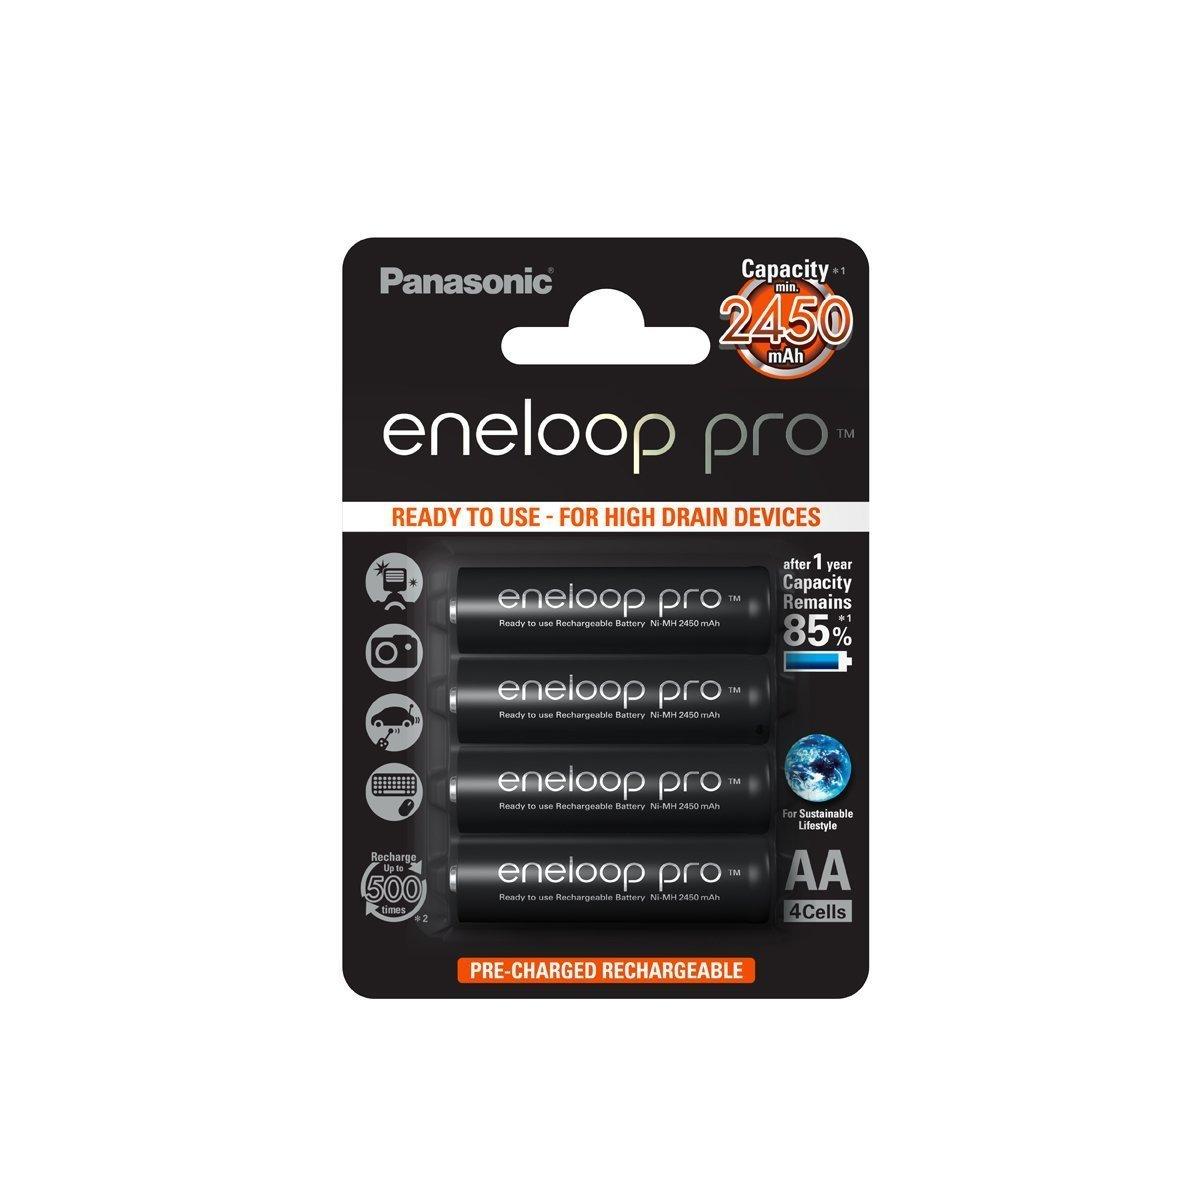 Amazon Oster Tagesangebote vom 16. März - u.a. mit: Panasonic eneloop Akkus zum Aktionspreis